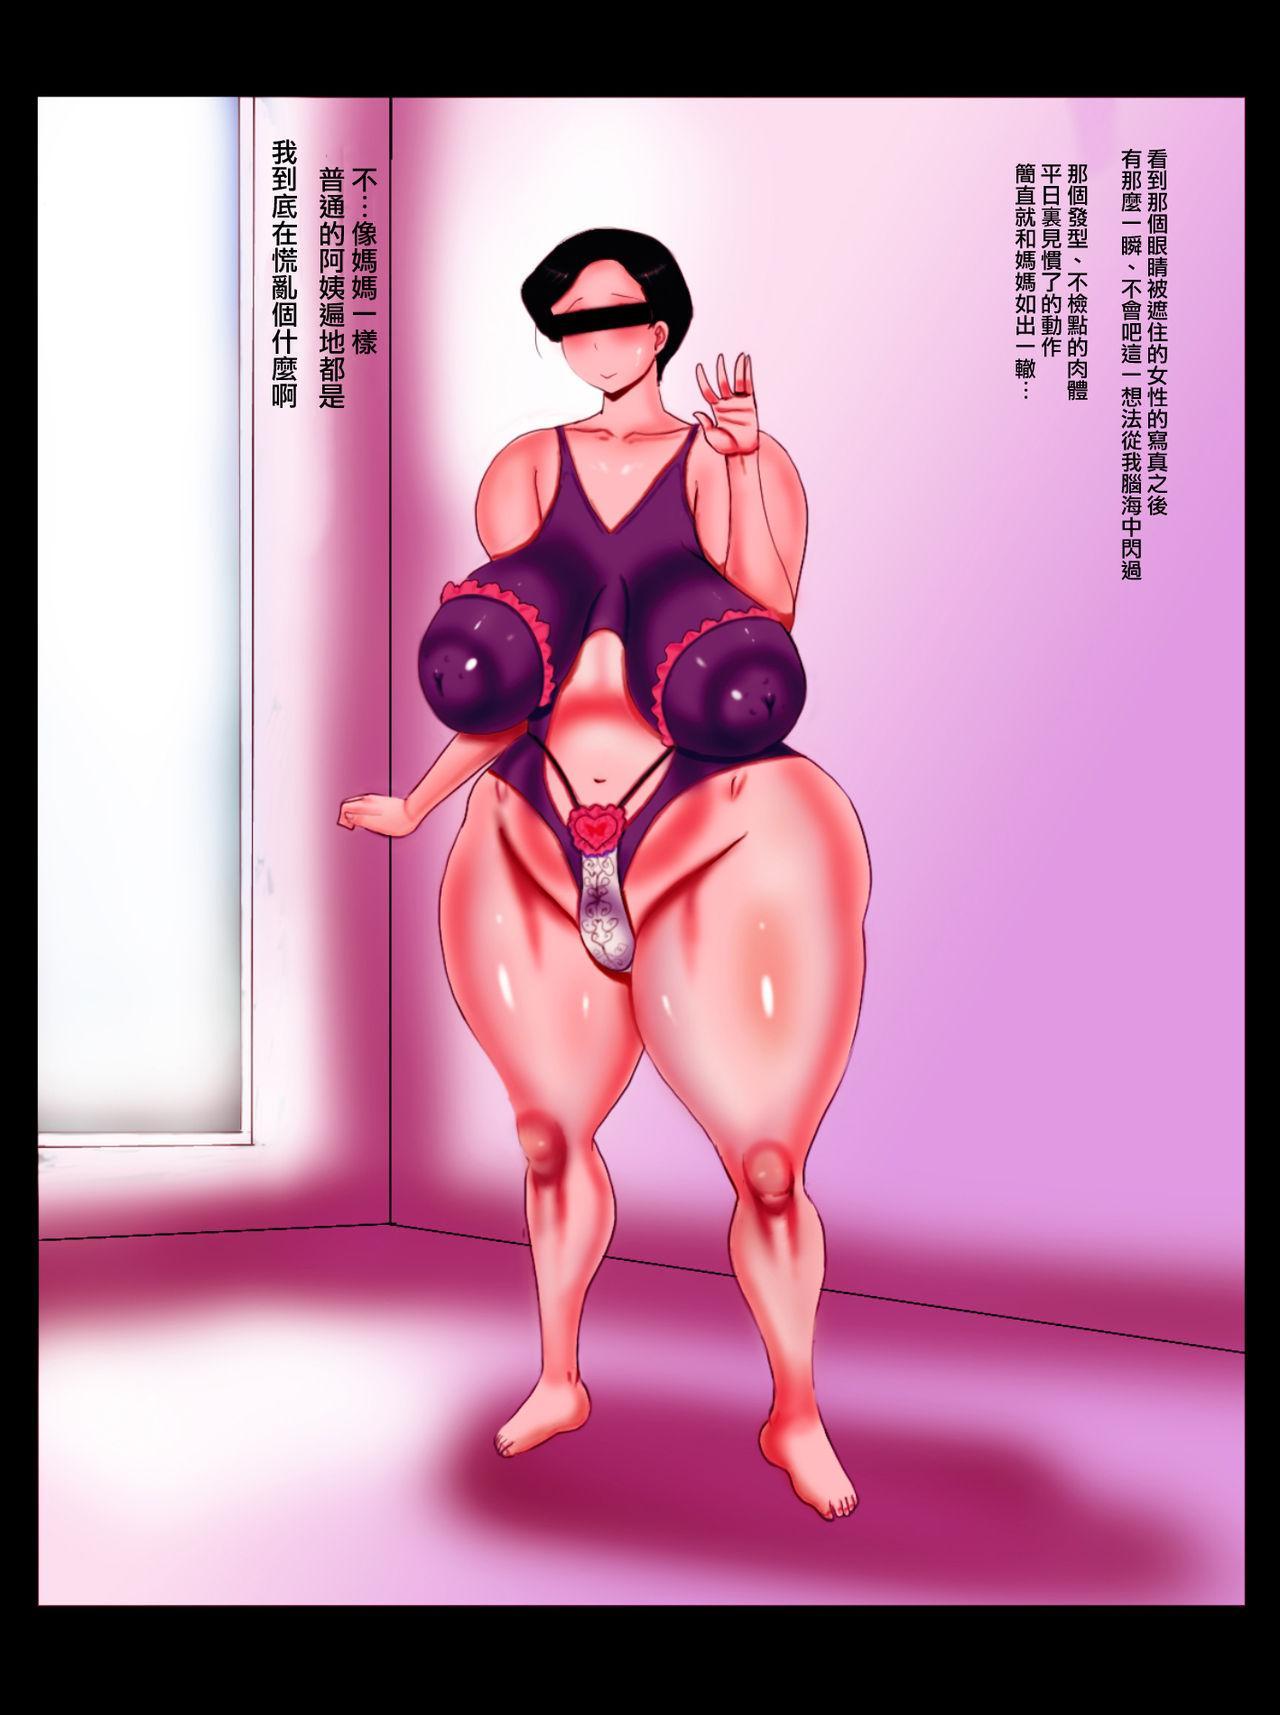 Net Koukai Sareta Haha | 網絡出鏡的媽媽 2